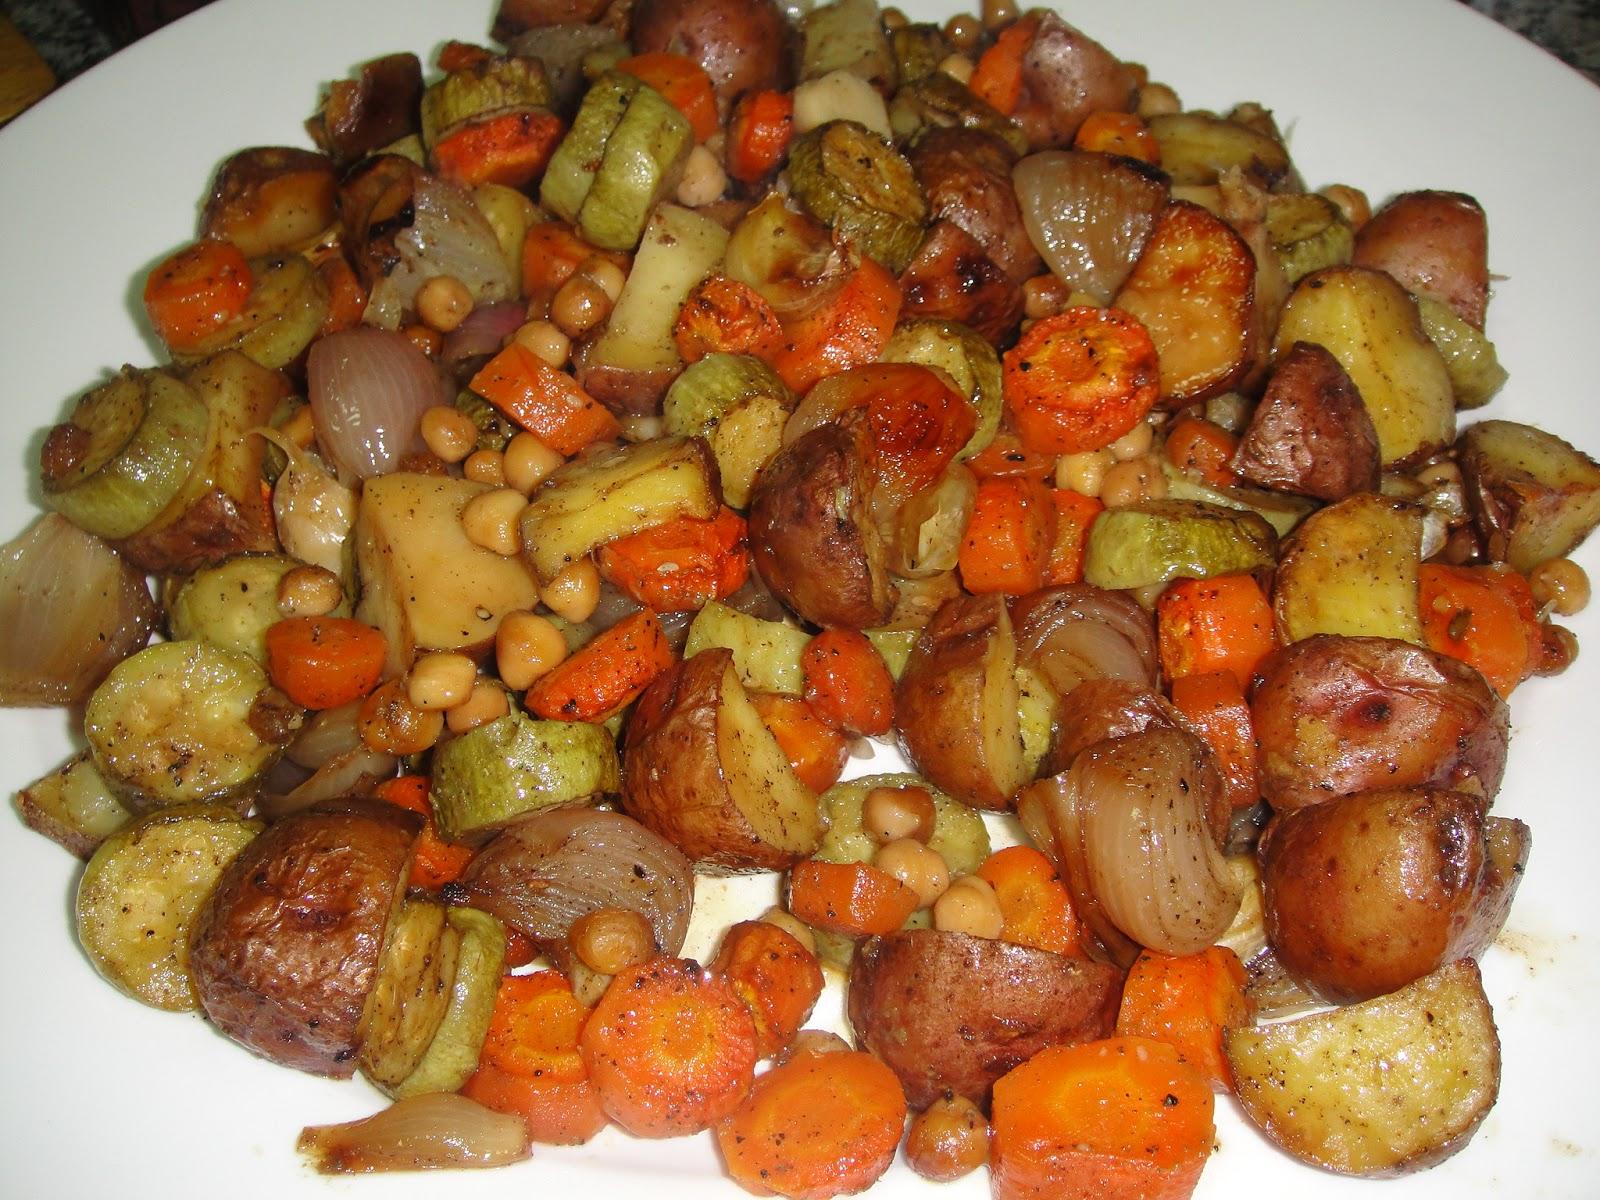 Maryam's Culinary Wonders: 209. Roasted Vegetables